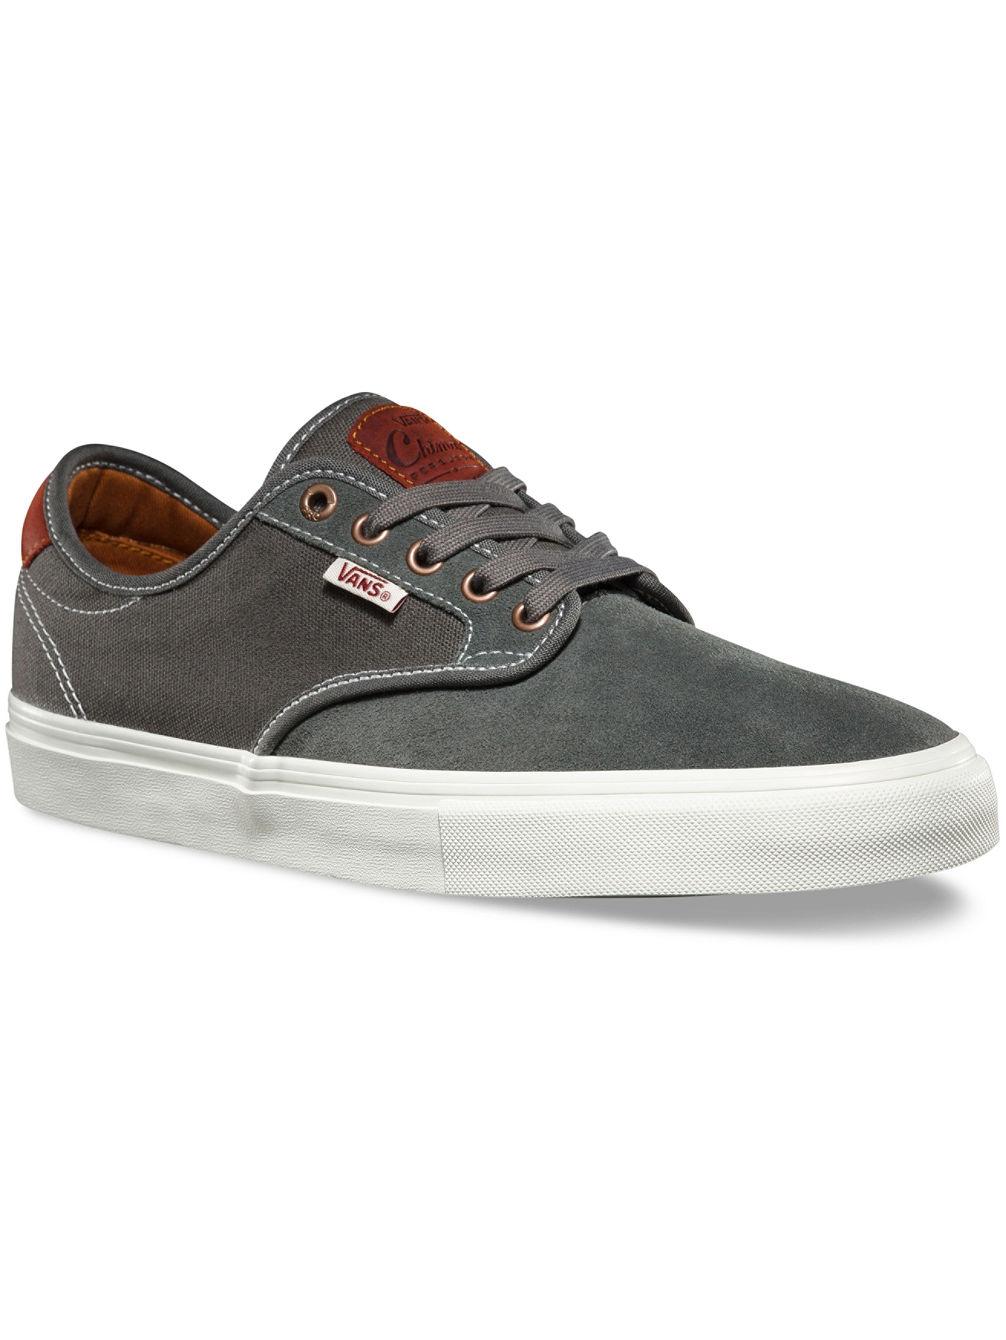 9eed1aa8c9079a Buy Vans Chima Ferguson Pro Skate Shoes online at blue-tomato.com